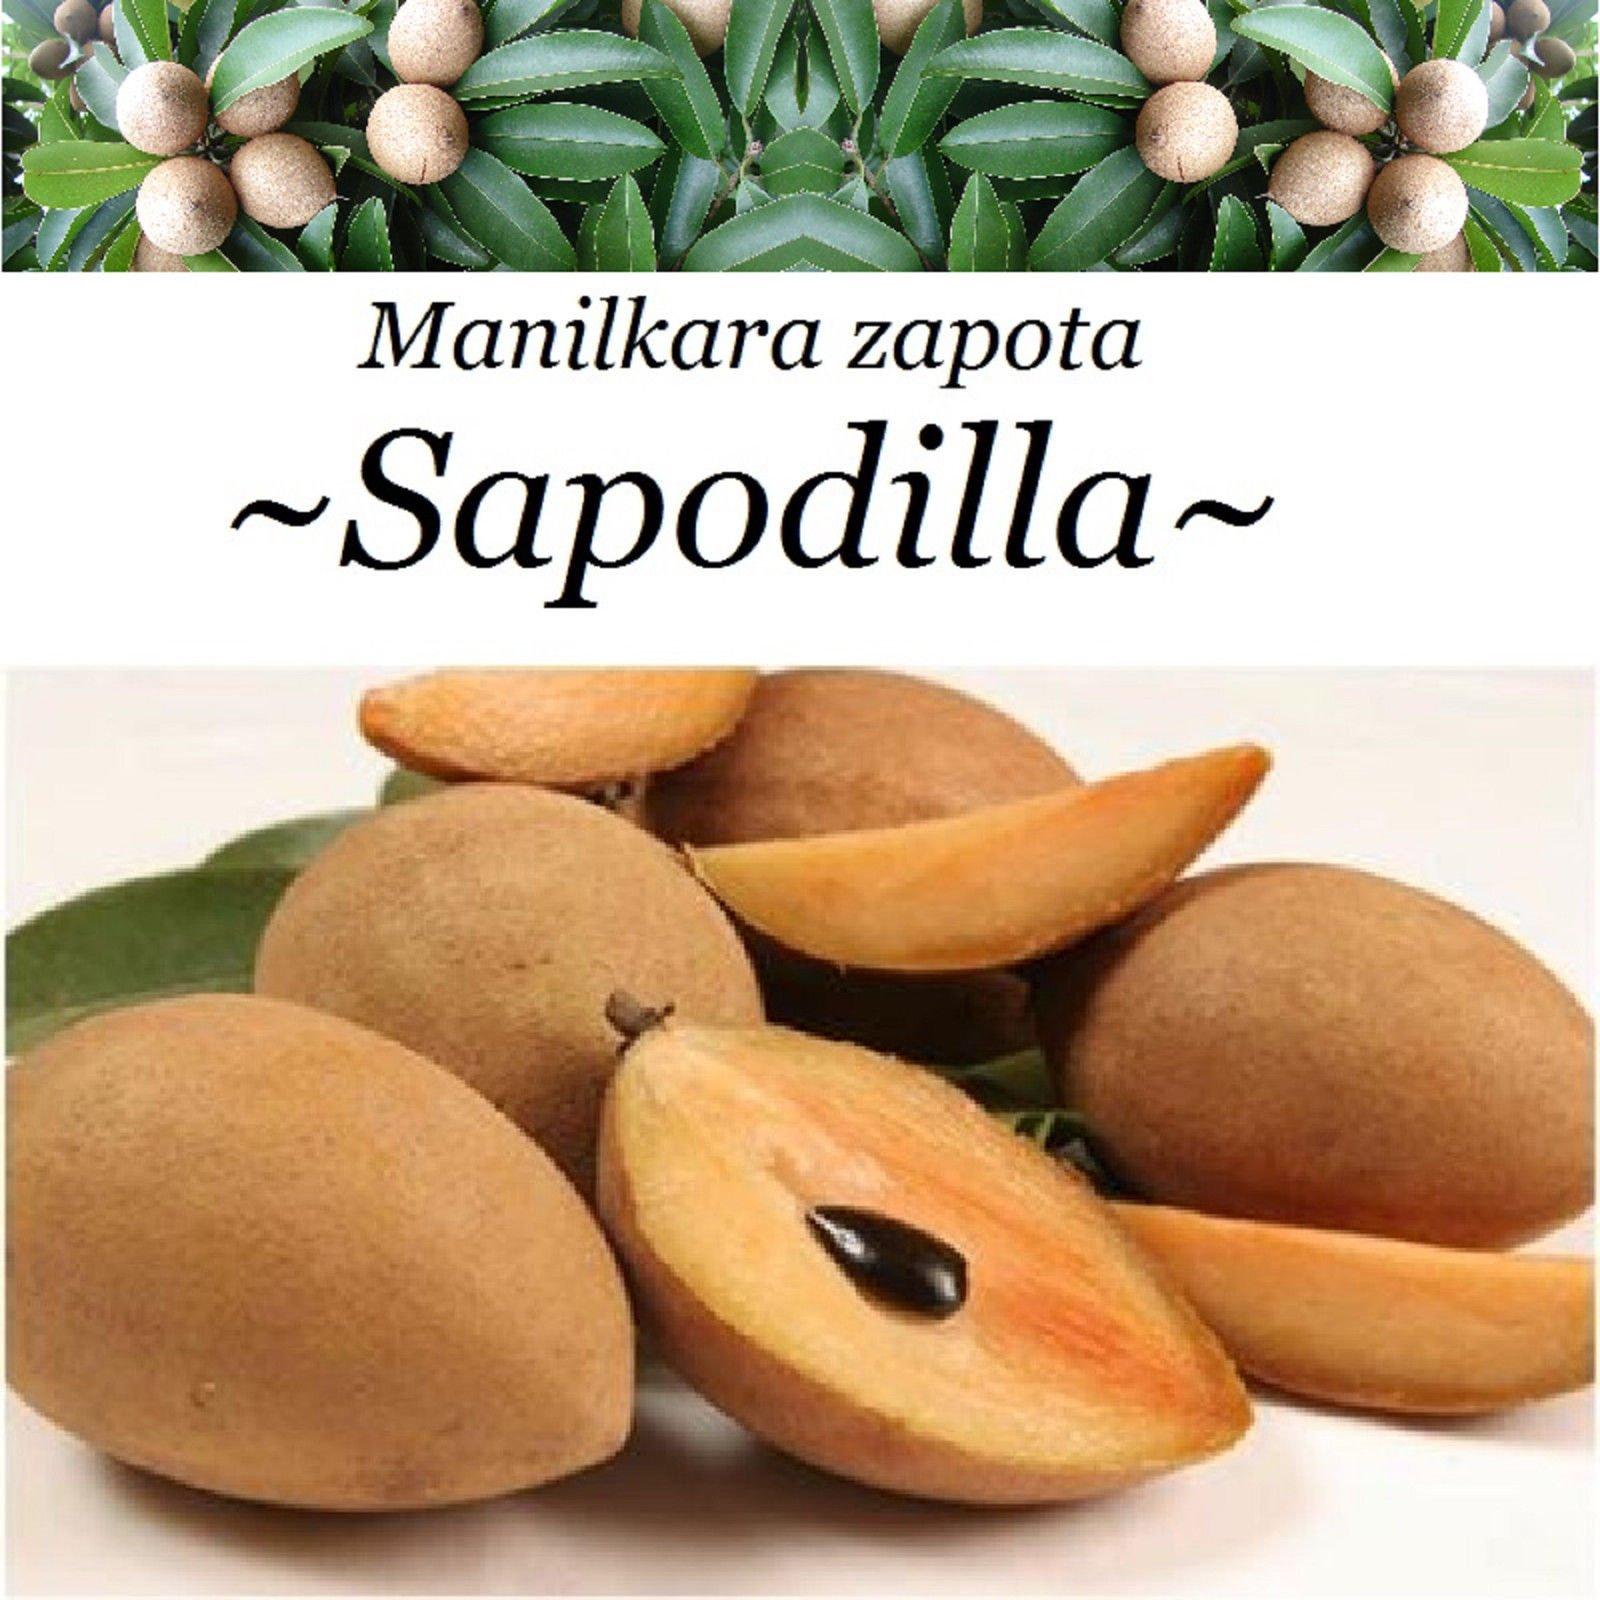 SAPODILLA~ Manilkara zapota Chico Sapote Nispero Live Small Pot'd Starter Plant by 7_heads (Image #1)